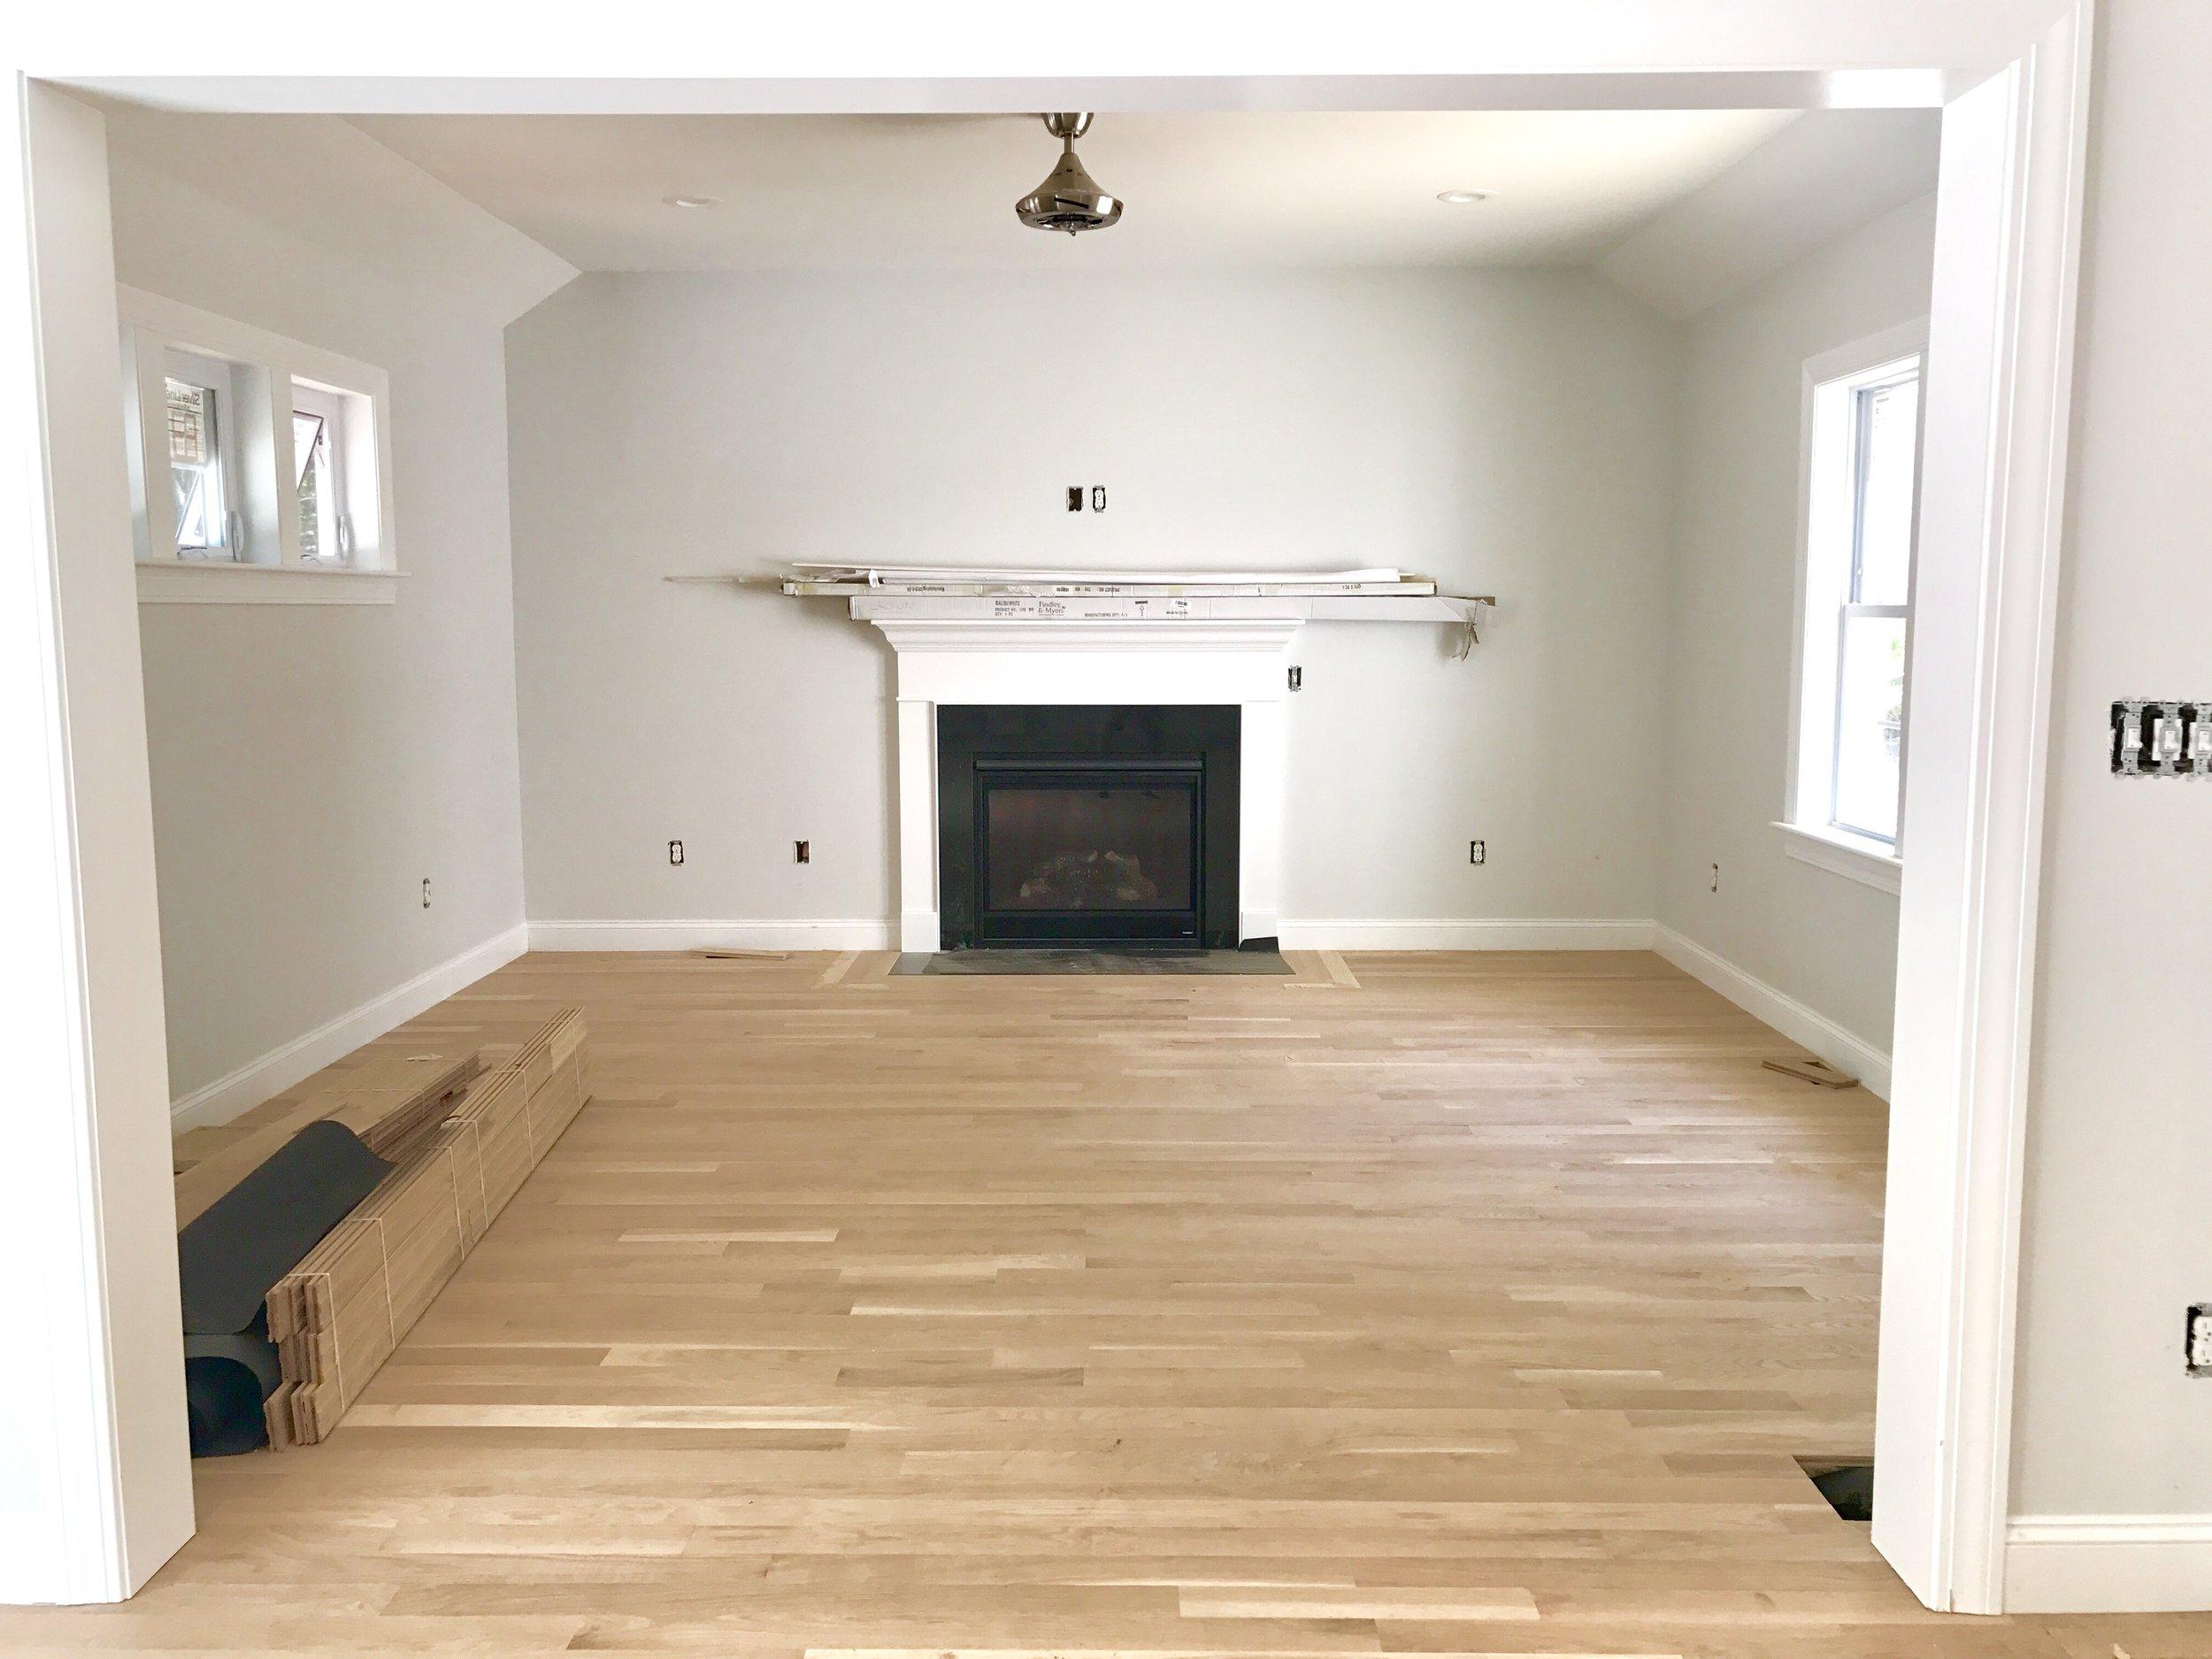 35 laurel 7-19-18 fireplace.jpg